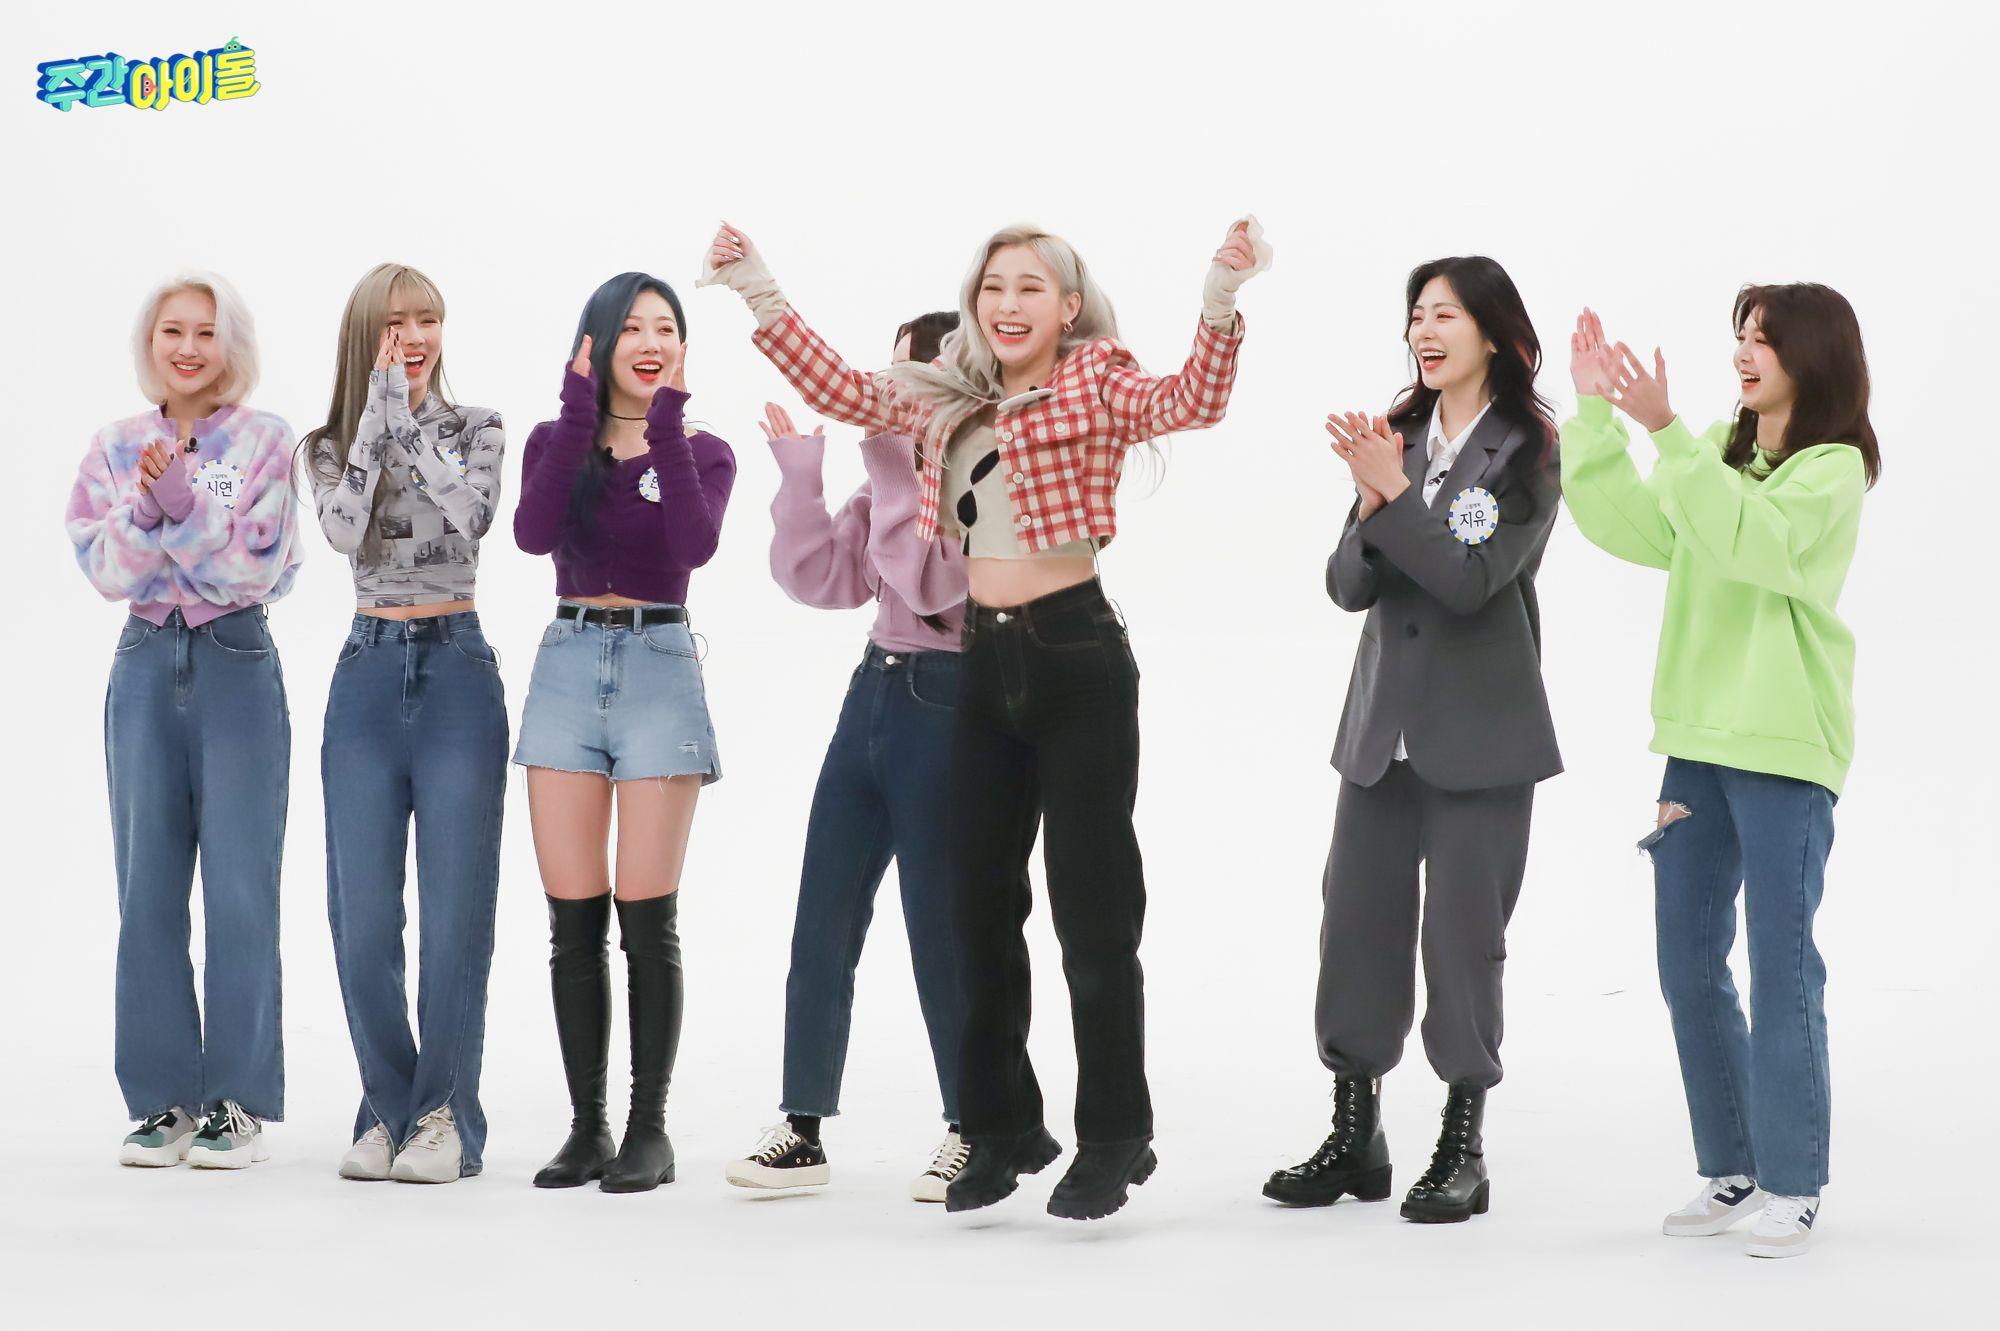 Mbc M On Twitter In 2021 Dream Catcher Kpop Girl Groups Pop Group